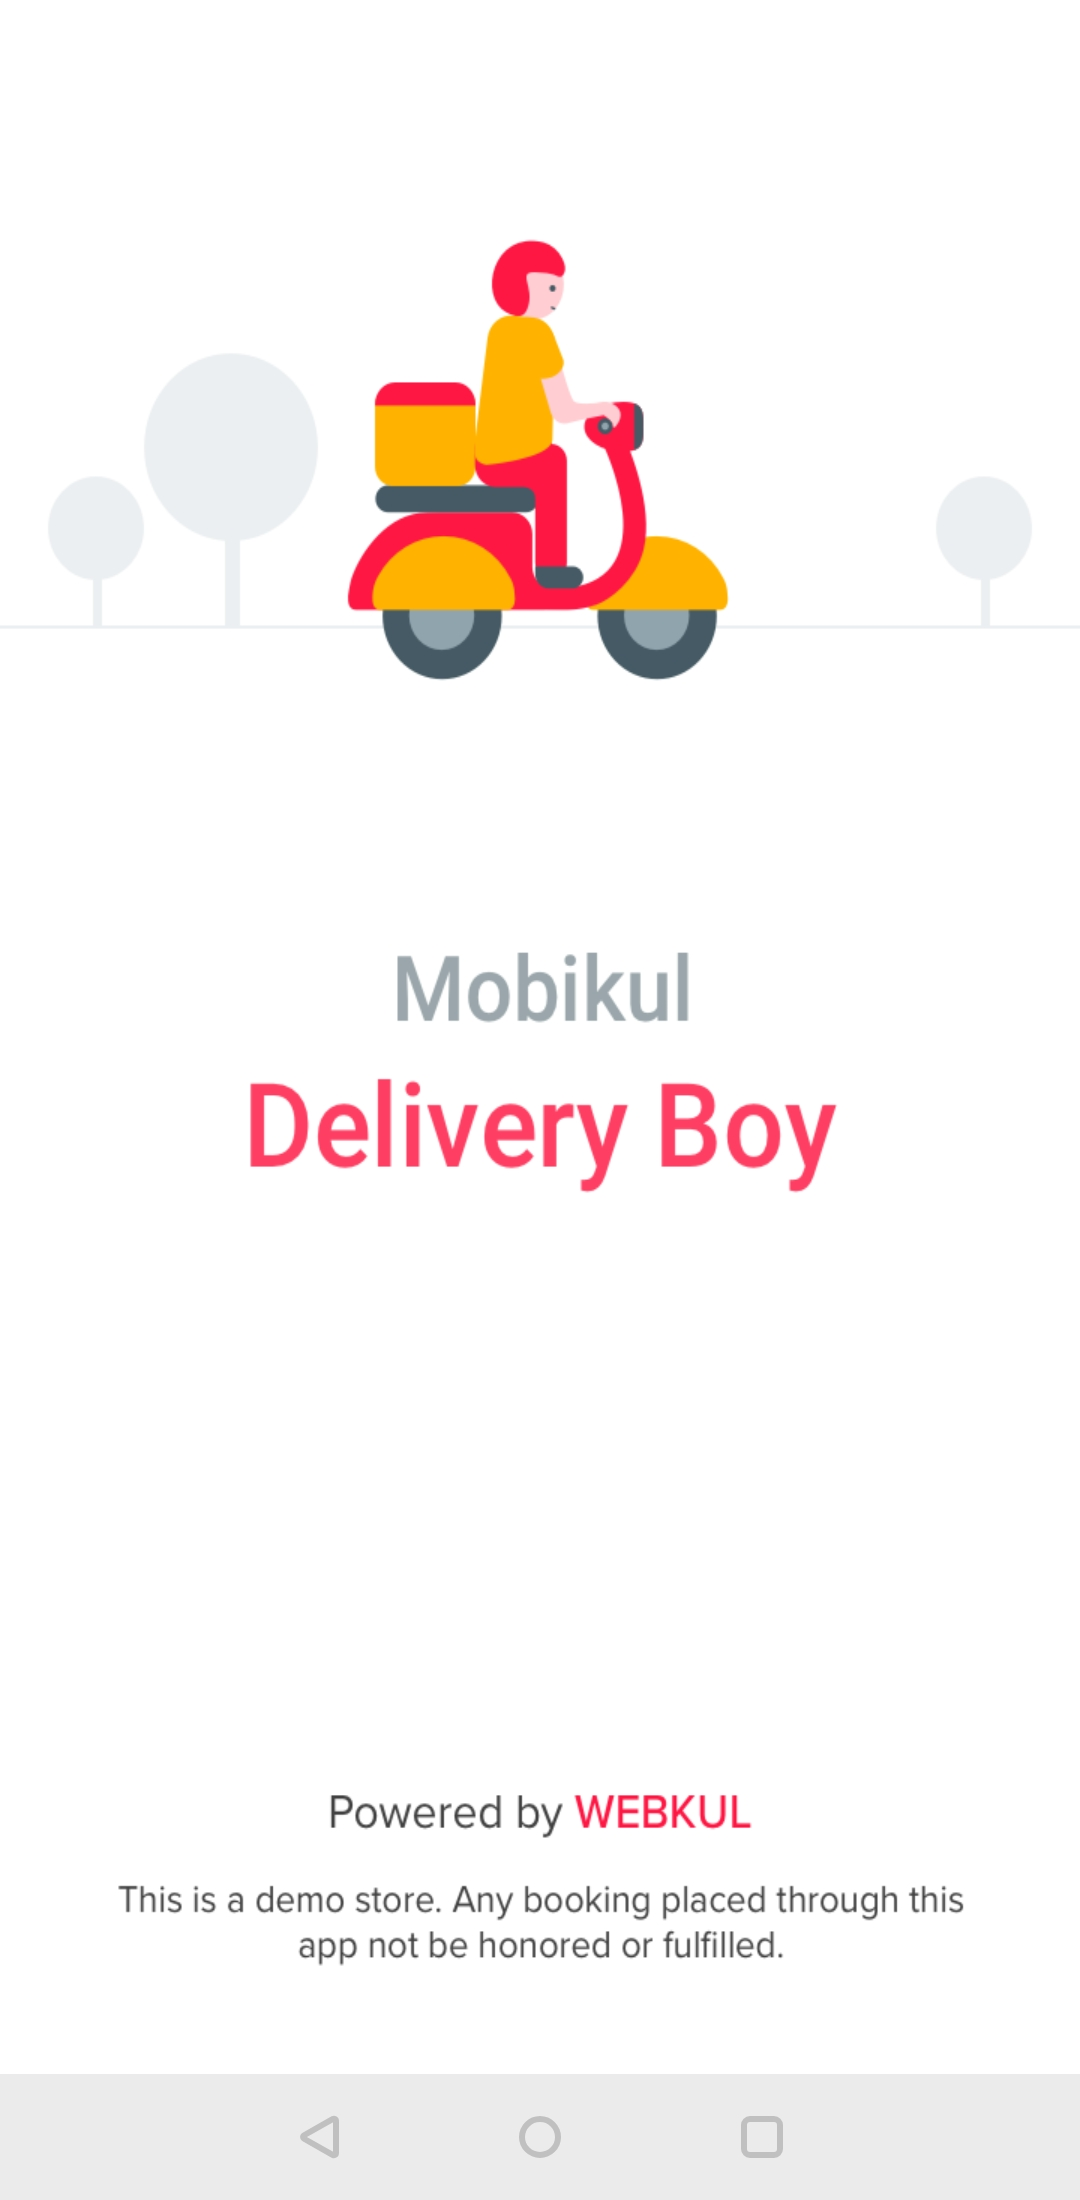 Magento 2 Mobikul Delivery Boy App